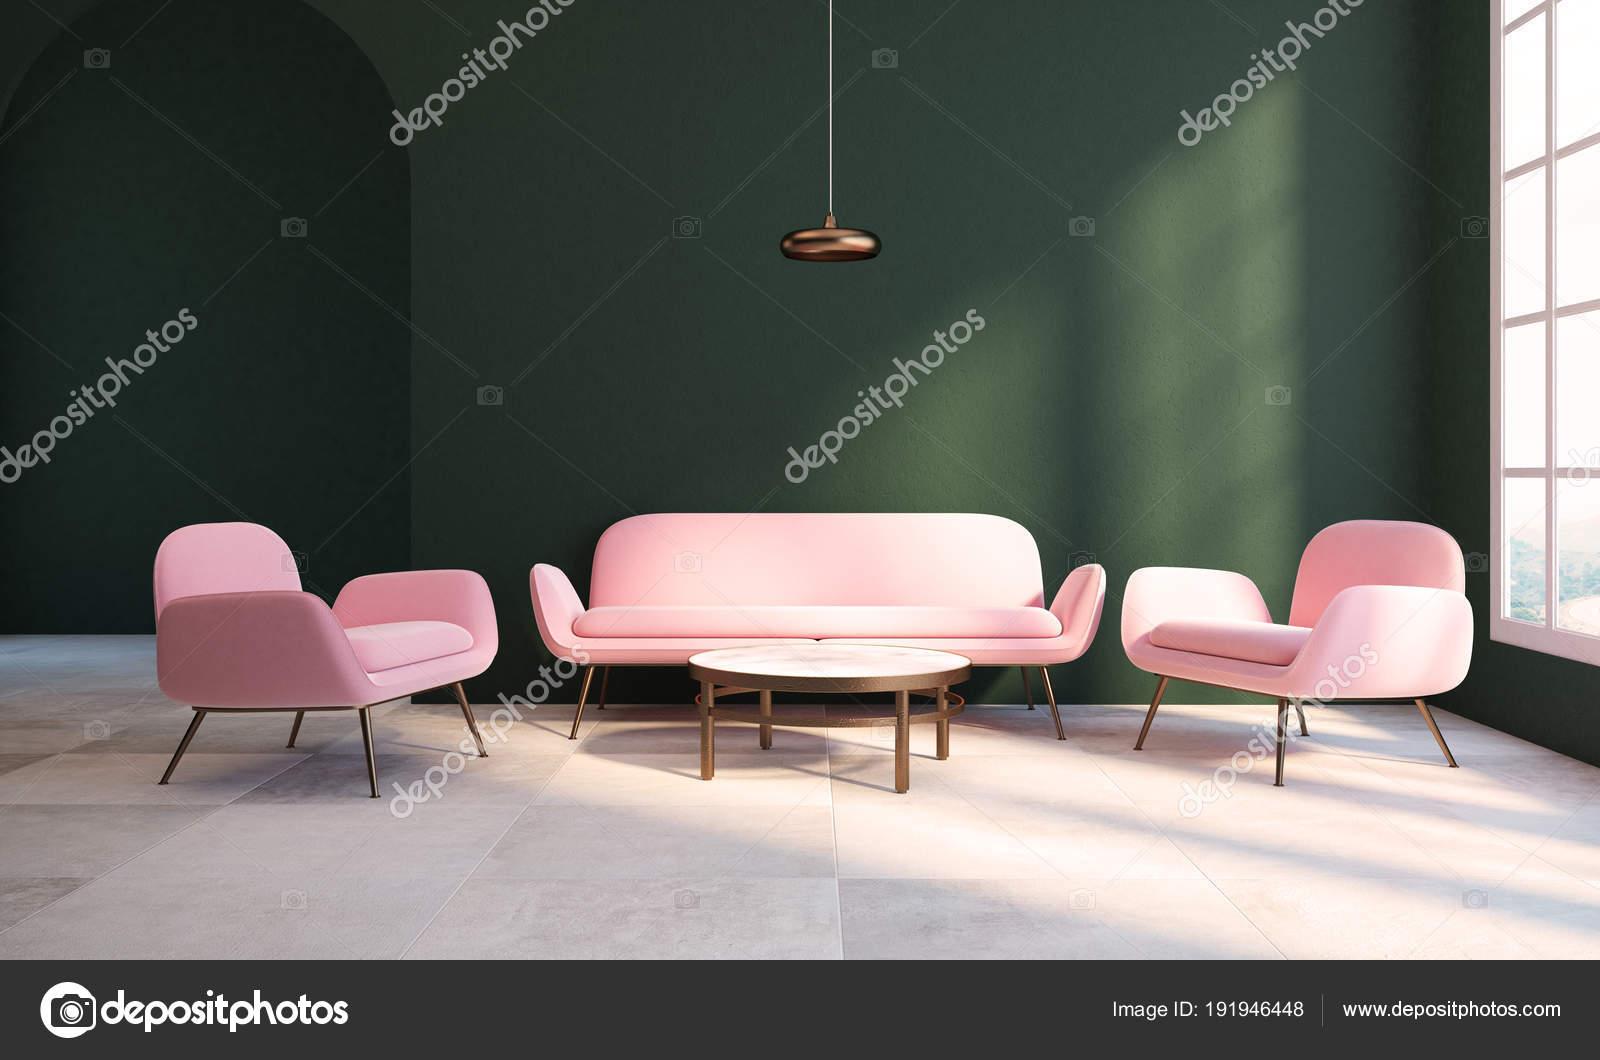 Amazing Empty Green Living Room, Pink Armchair And Sofa U2014 Stock Photo